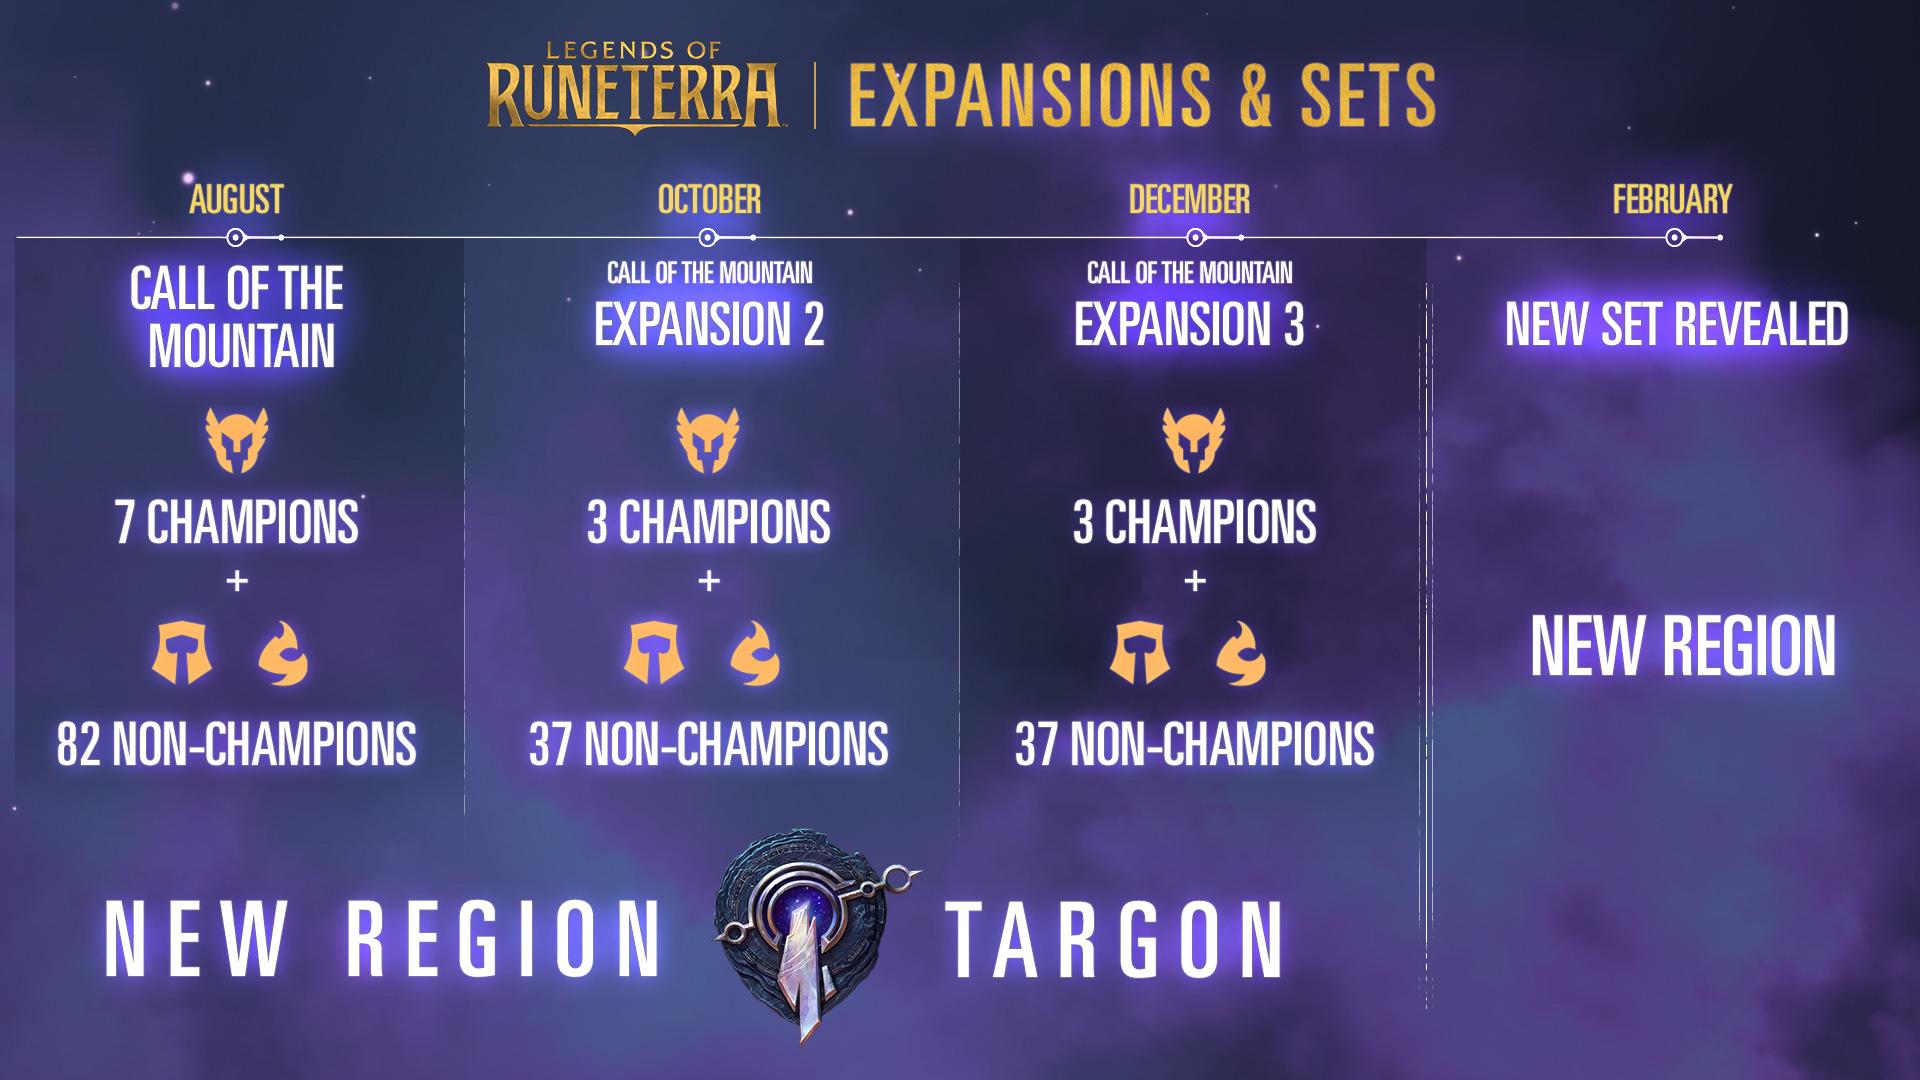 Legends of Runeterra 2020 roadmap